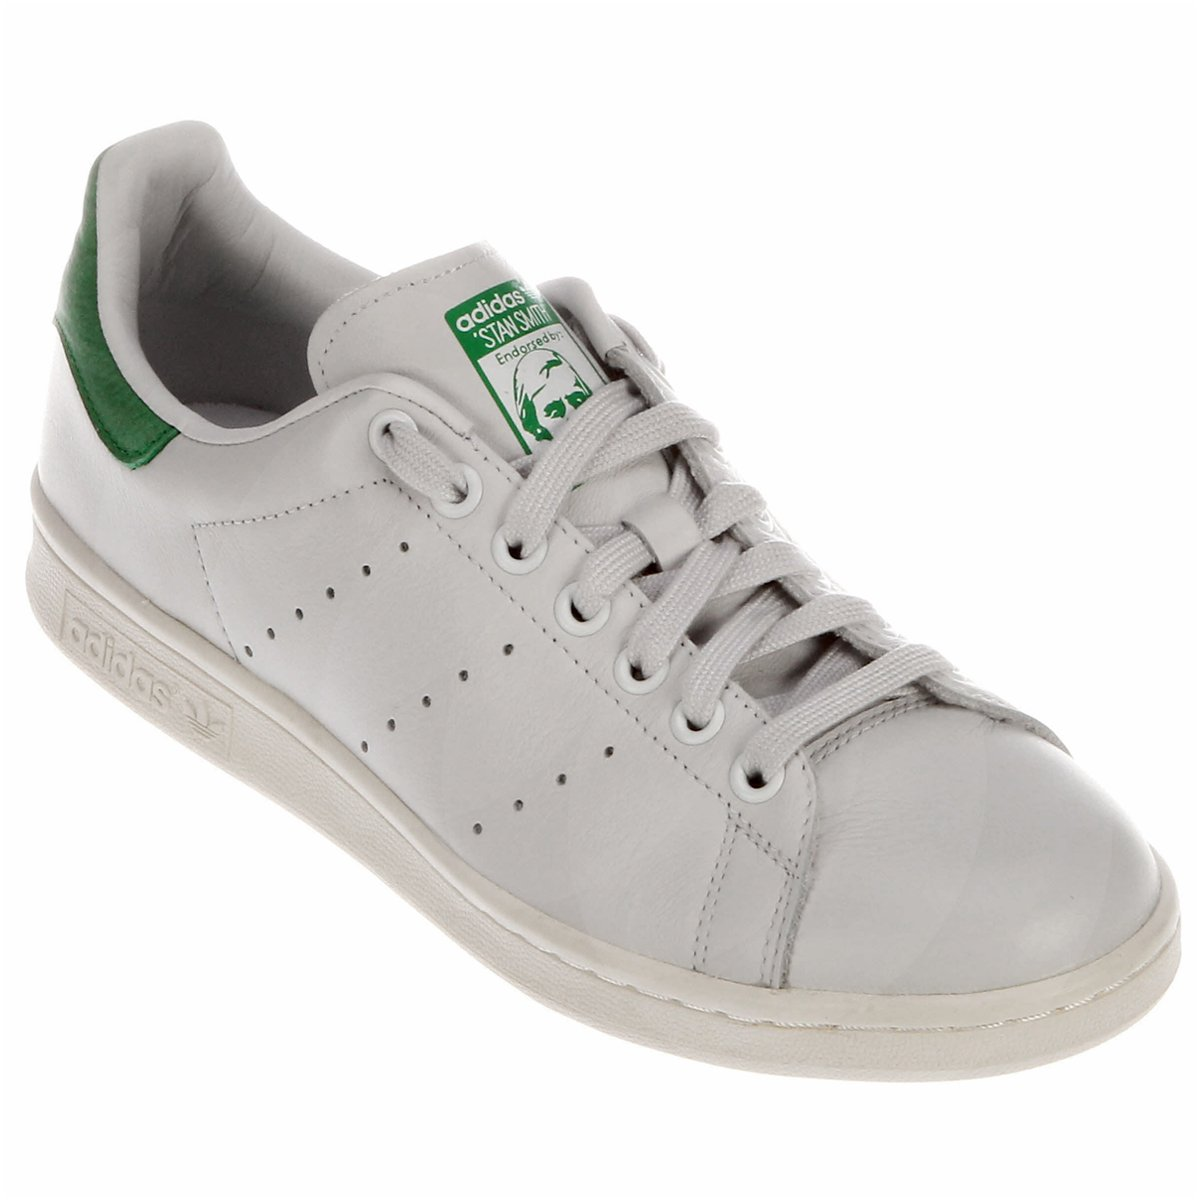 2dcb5da4ef2d Tênis Adidas Stan Smith - Branco e Cinza - Compre Agora